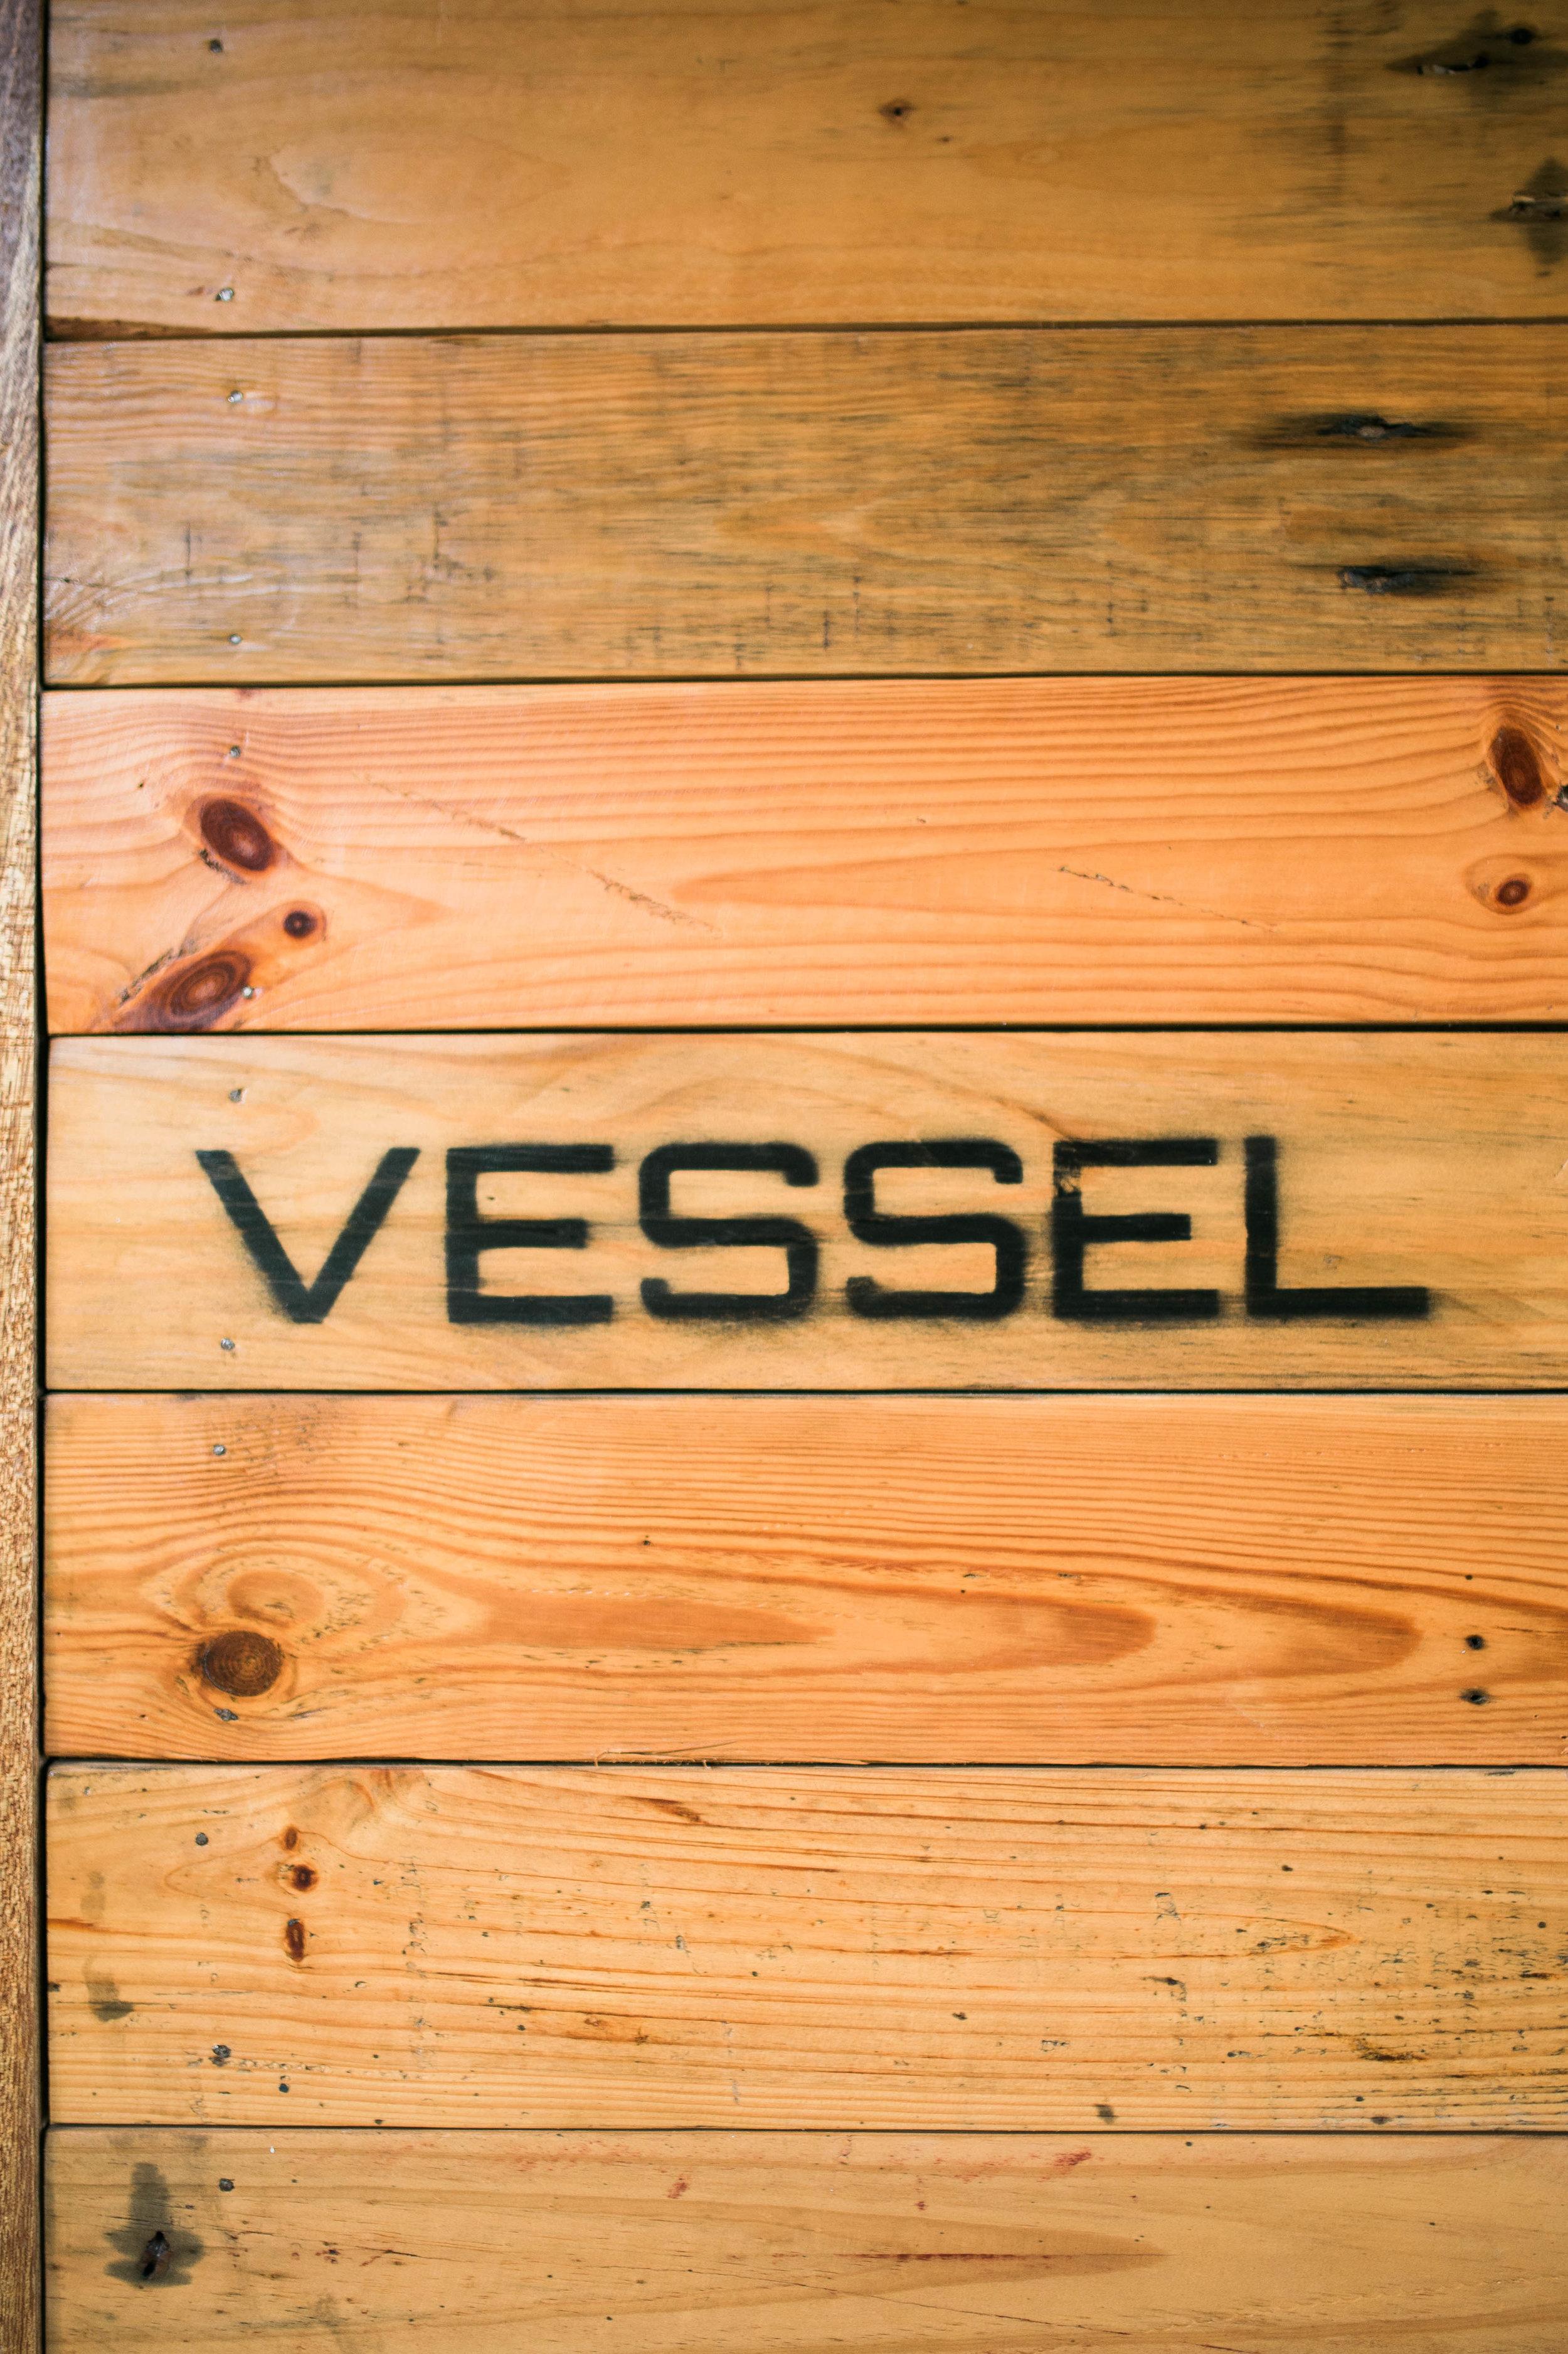 vessel-2.jpg